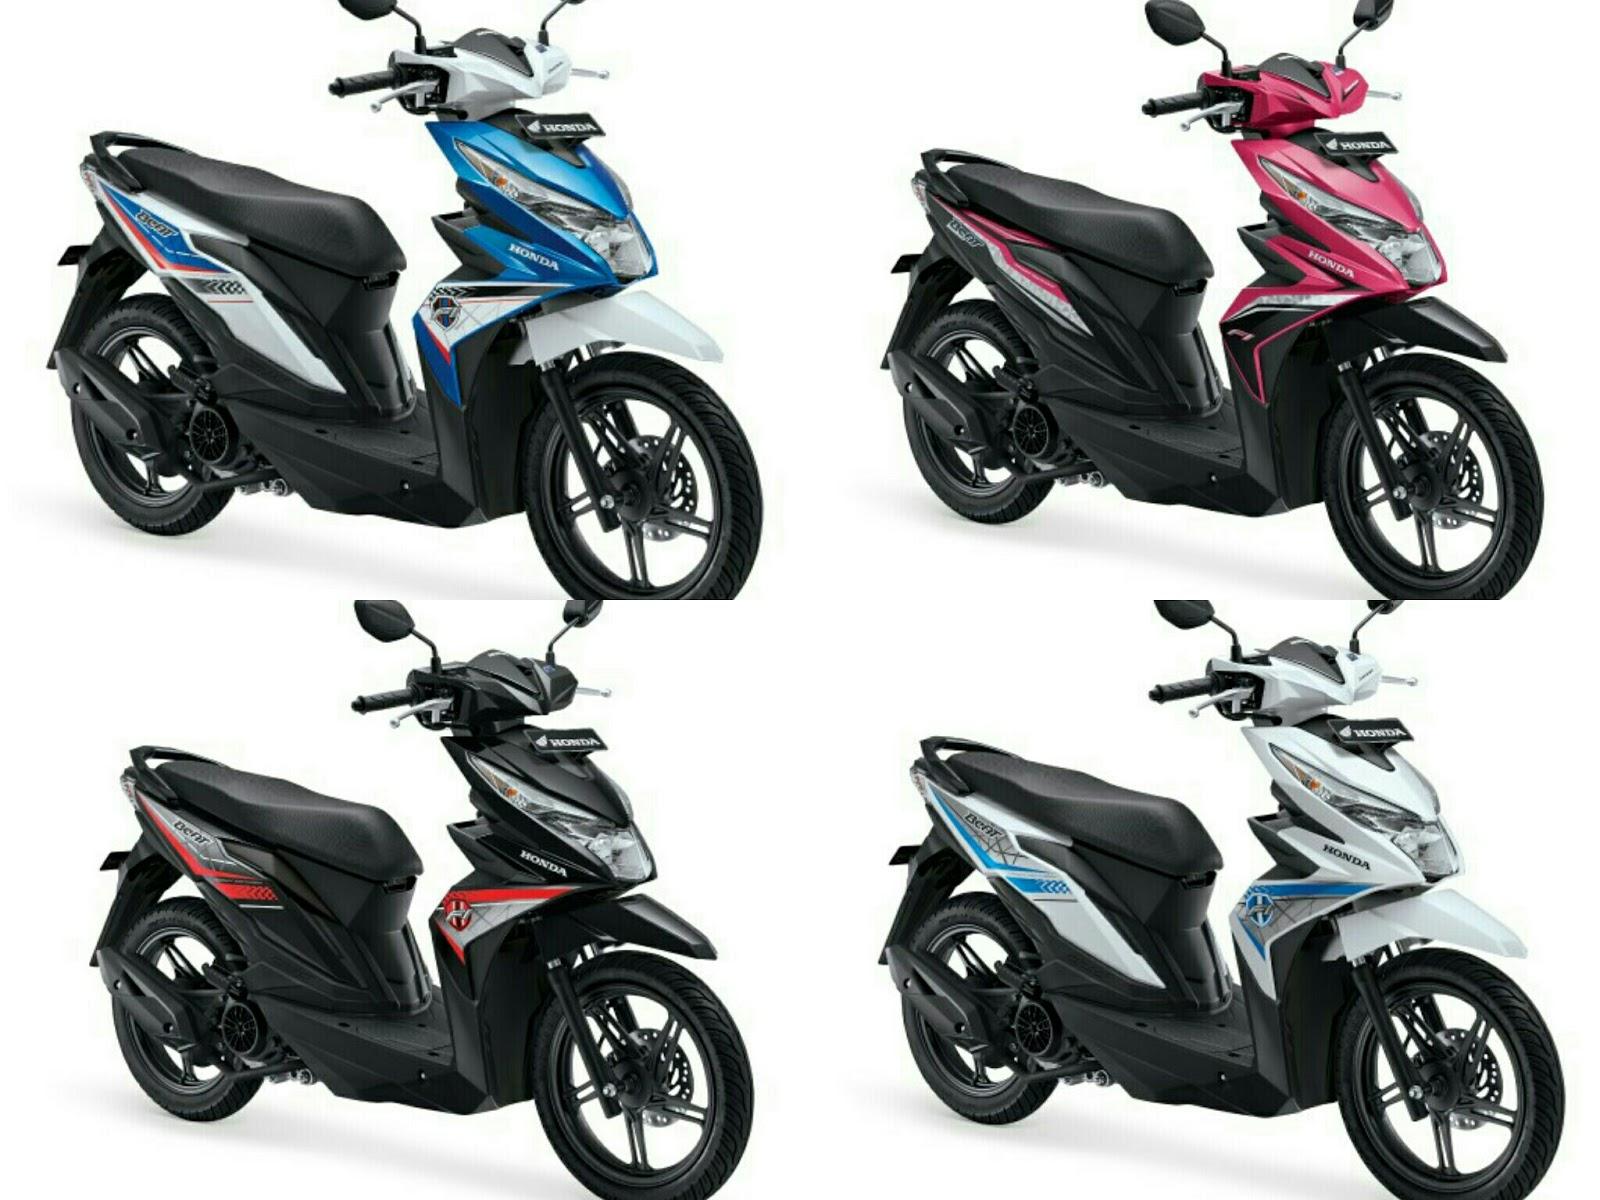 Info Harga All New Beat Sporty Esp Cw Dance White Cilacap Termurah Vario 110 Cbs Iss Glam Red Kebumen Varian Warna Honda 8 Pilihan